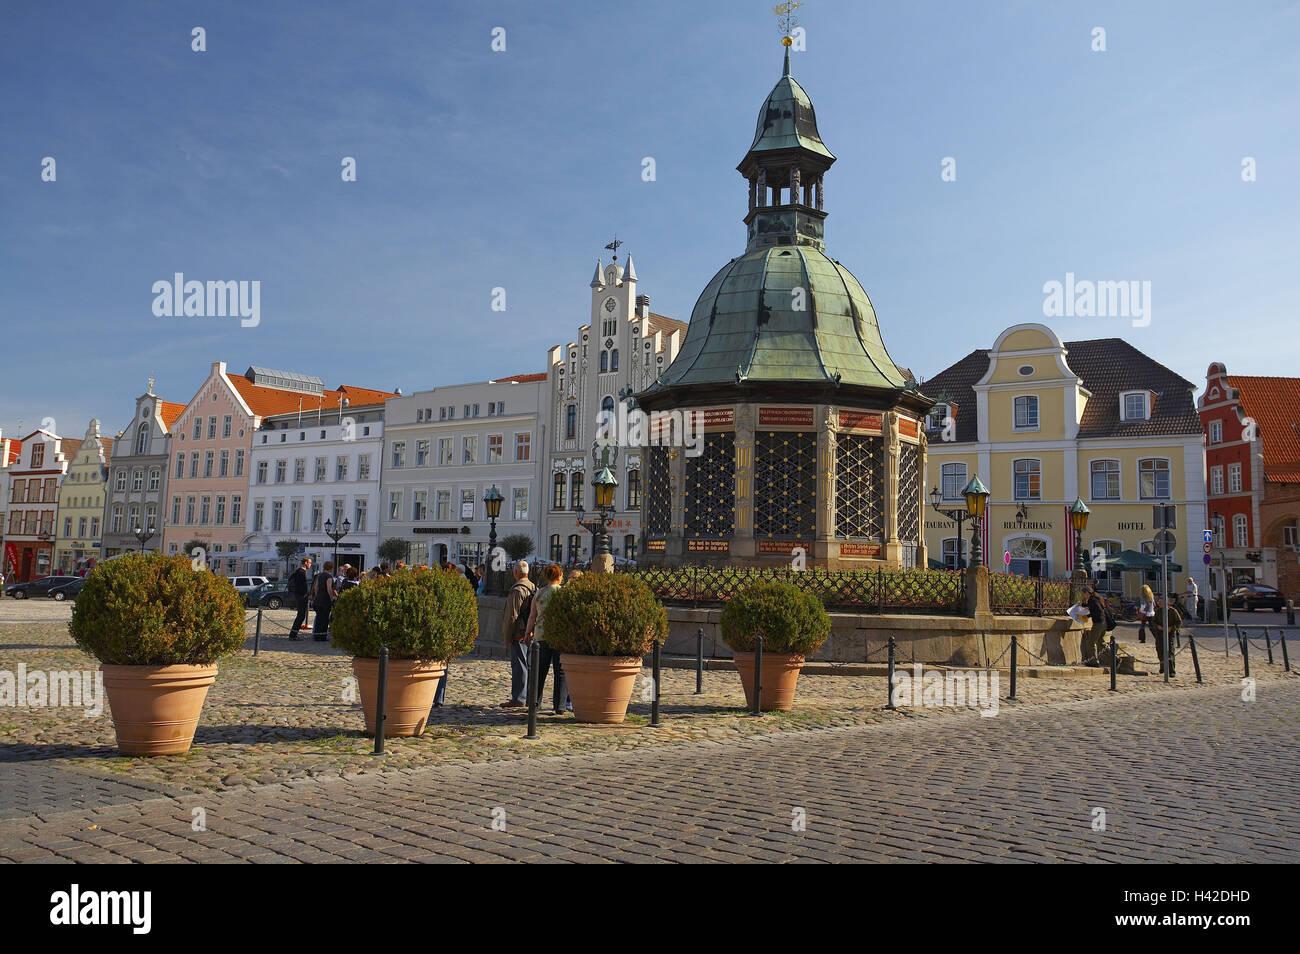 Germany, Mecklenburg-West Pomerania, Wismar, marketplace, water art, - Stock Image